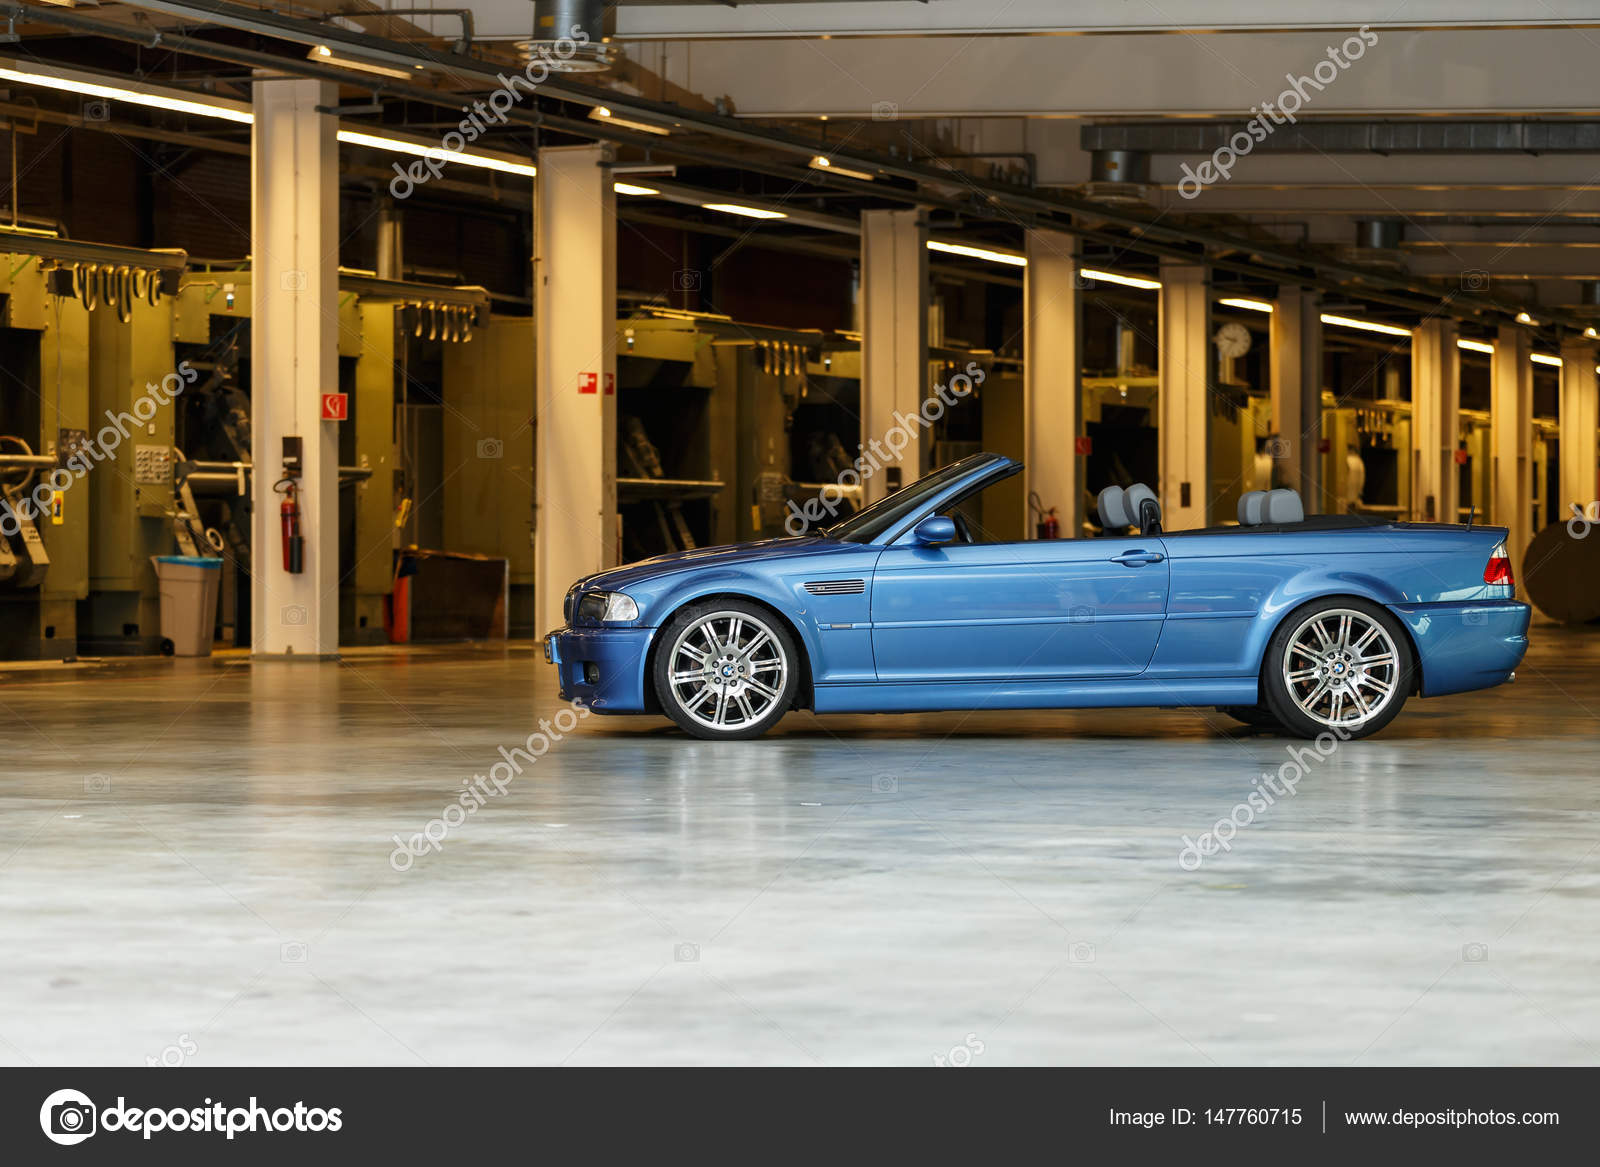 Bmw M3 E46 Convertible Standing In A Polder Stock Editorial Photo C Mennoschaefer 147760715